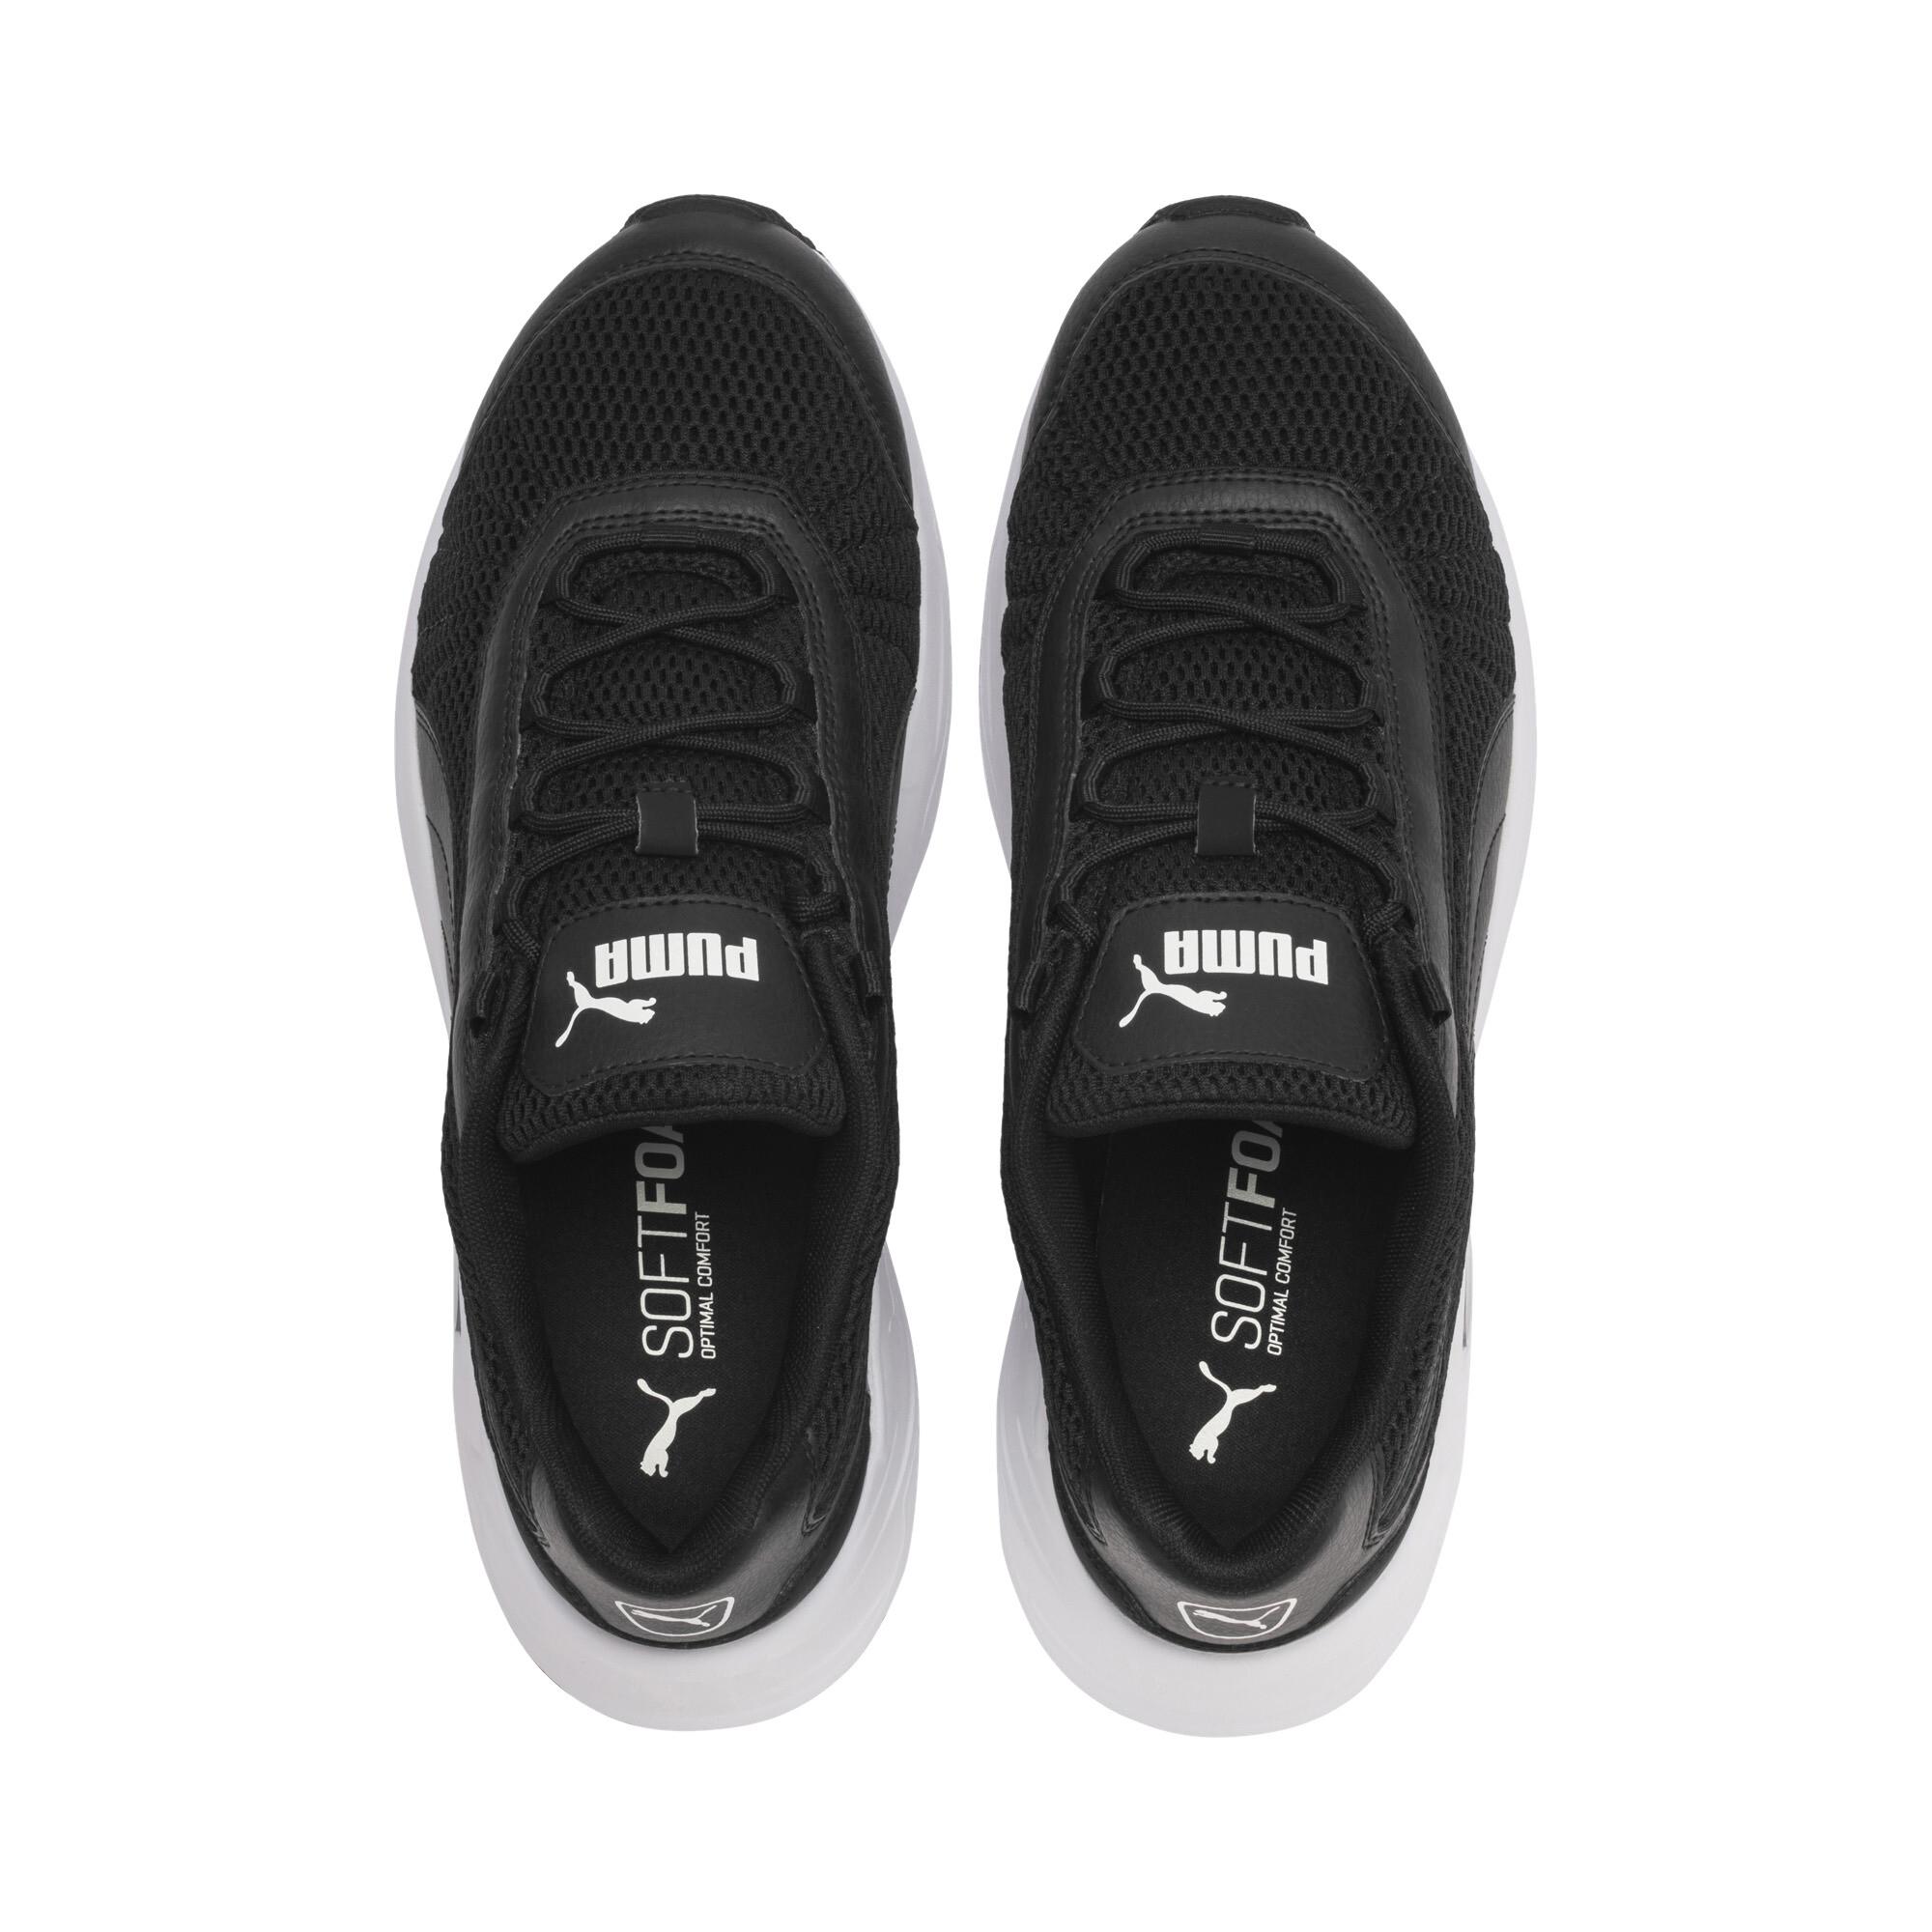 Indexbild 8 - PUMA Nucleus Trainingsschuhe Unisex Schuhe Basics Neu